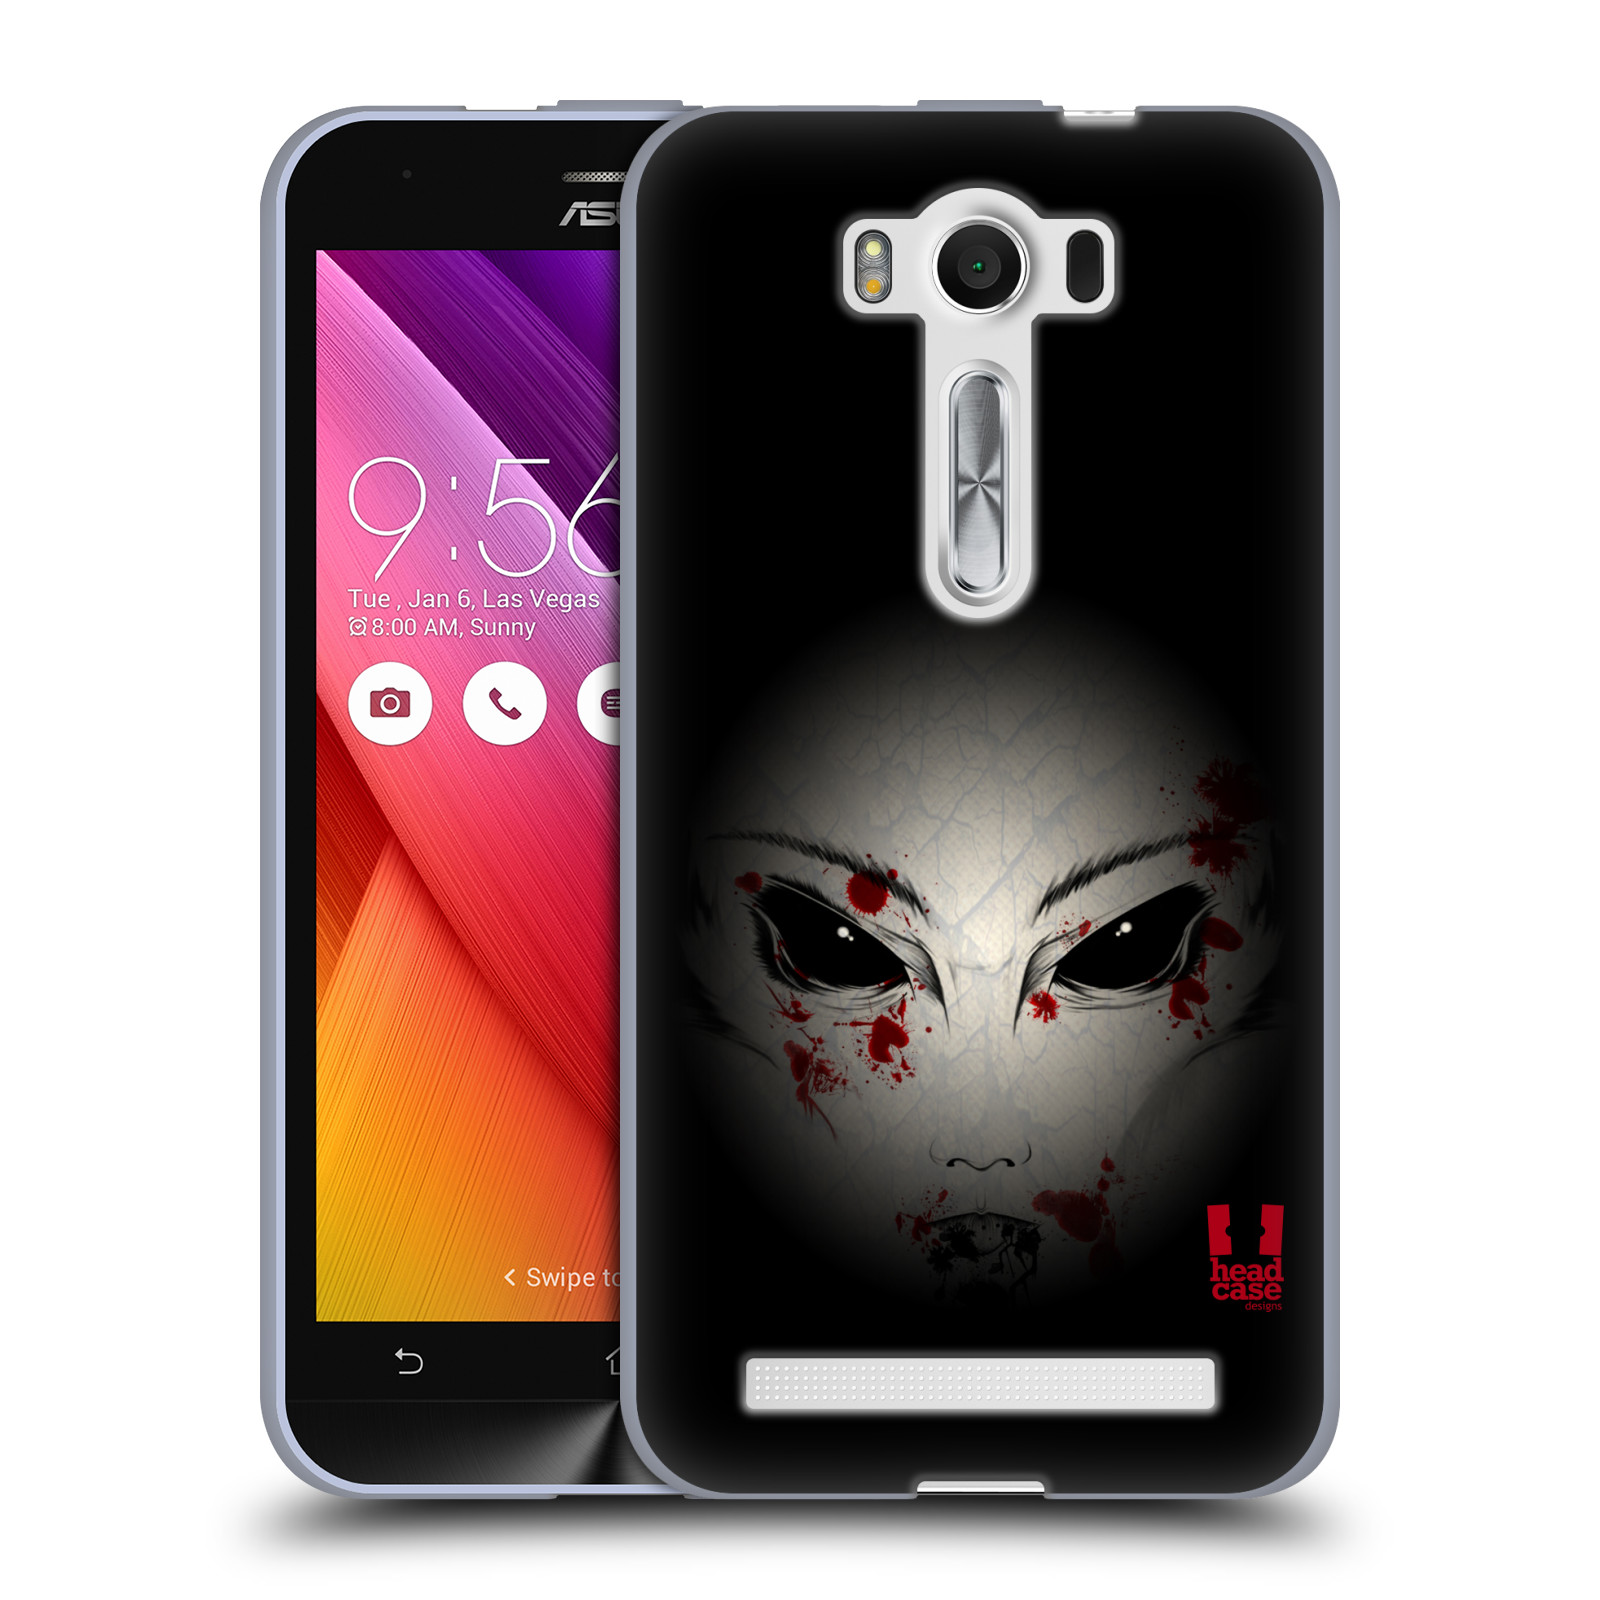 "Silikonové pouzdro na mobil Asus ZenFone 2 Laser ZE500KL HEAD CASE Macabre (Silikonový kryt či obal na mobilní telefon Asus ZenFone 2 Laser ZE500KL s 5"" displejem)"